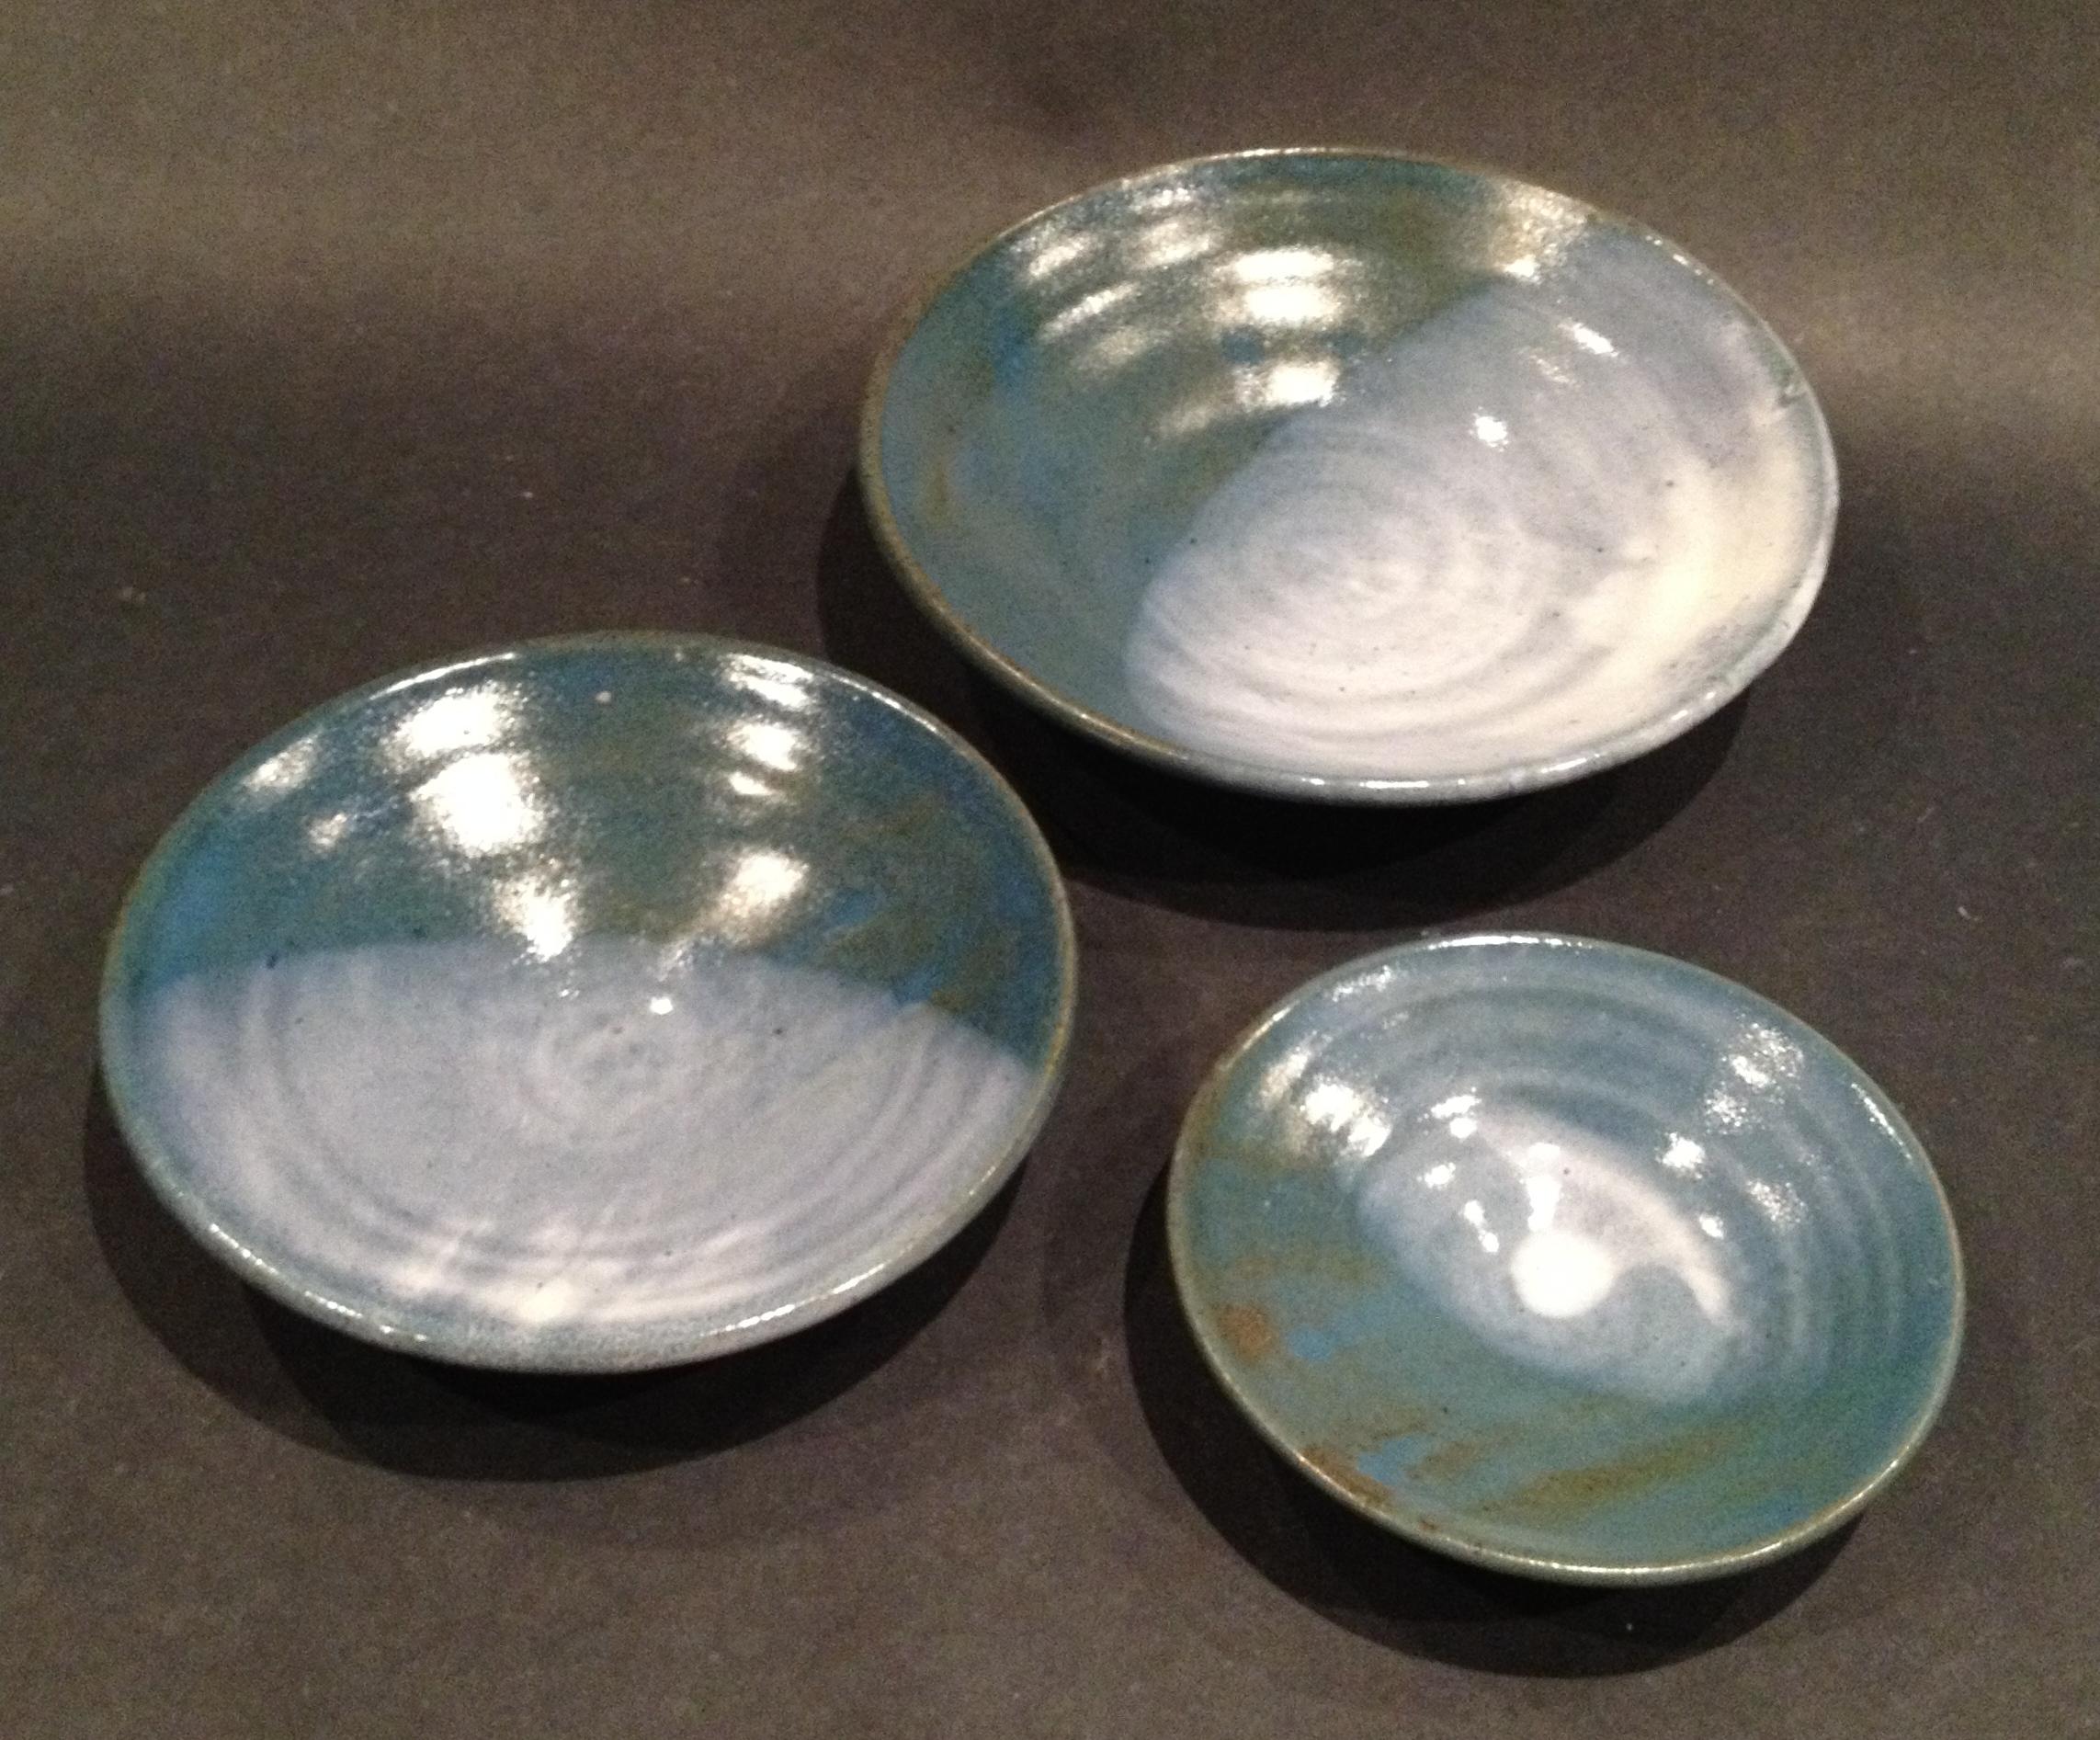 Nesting bowls (view 2)